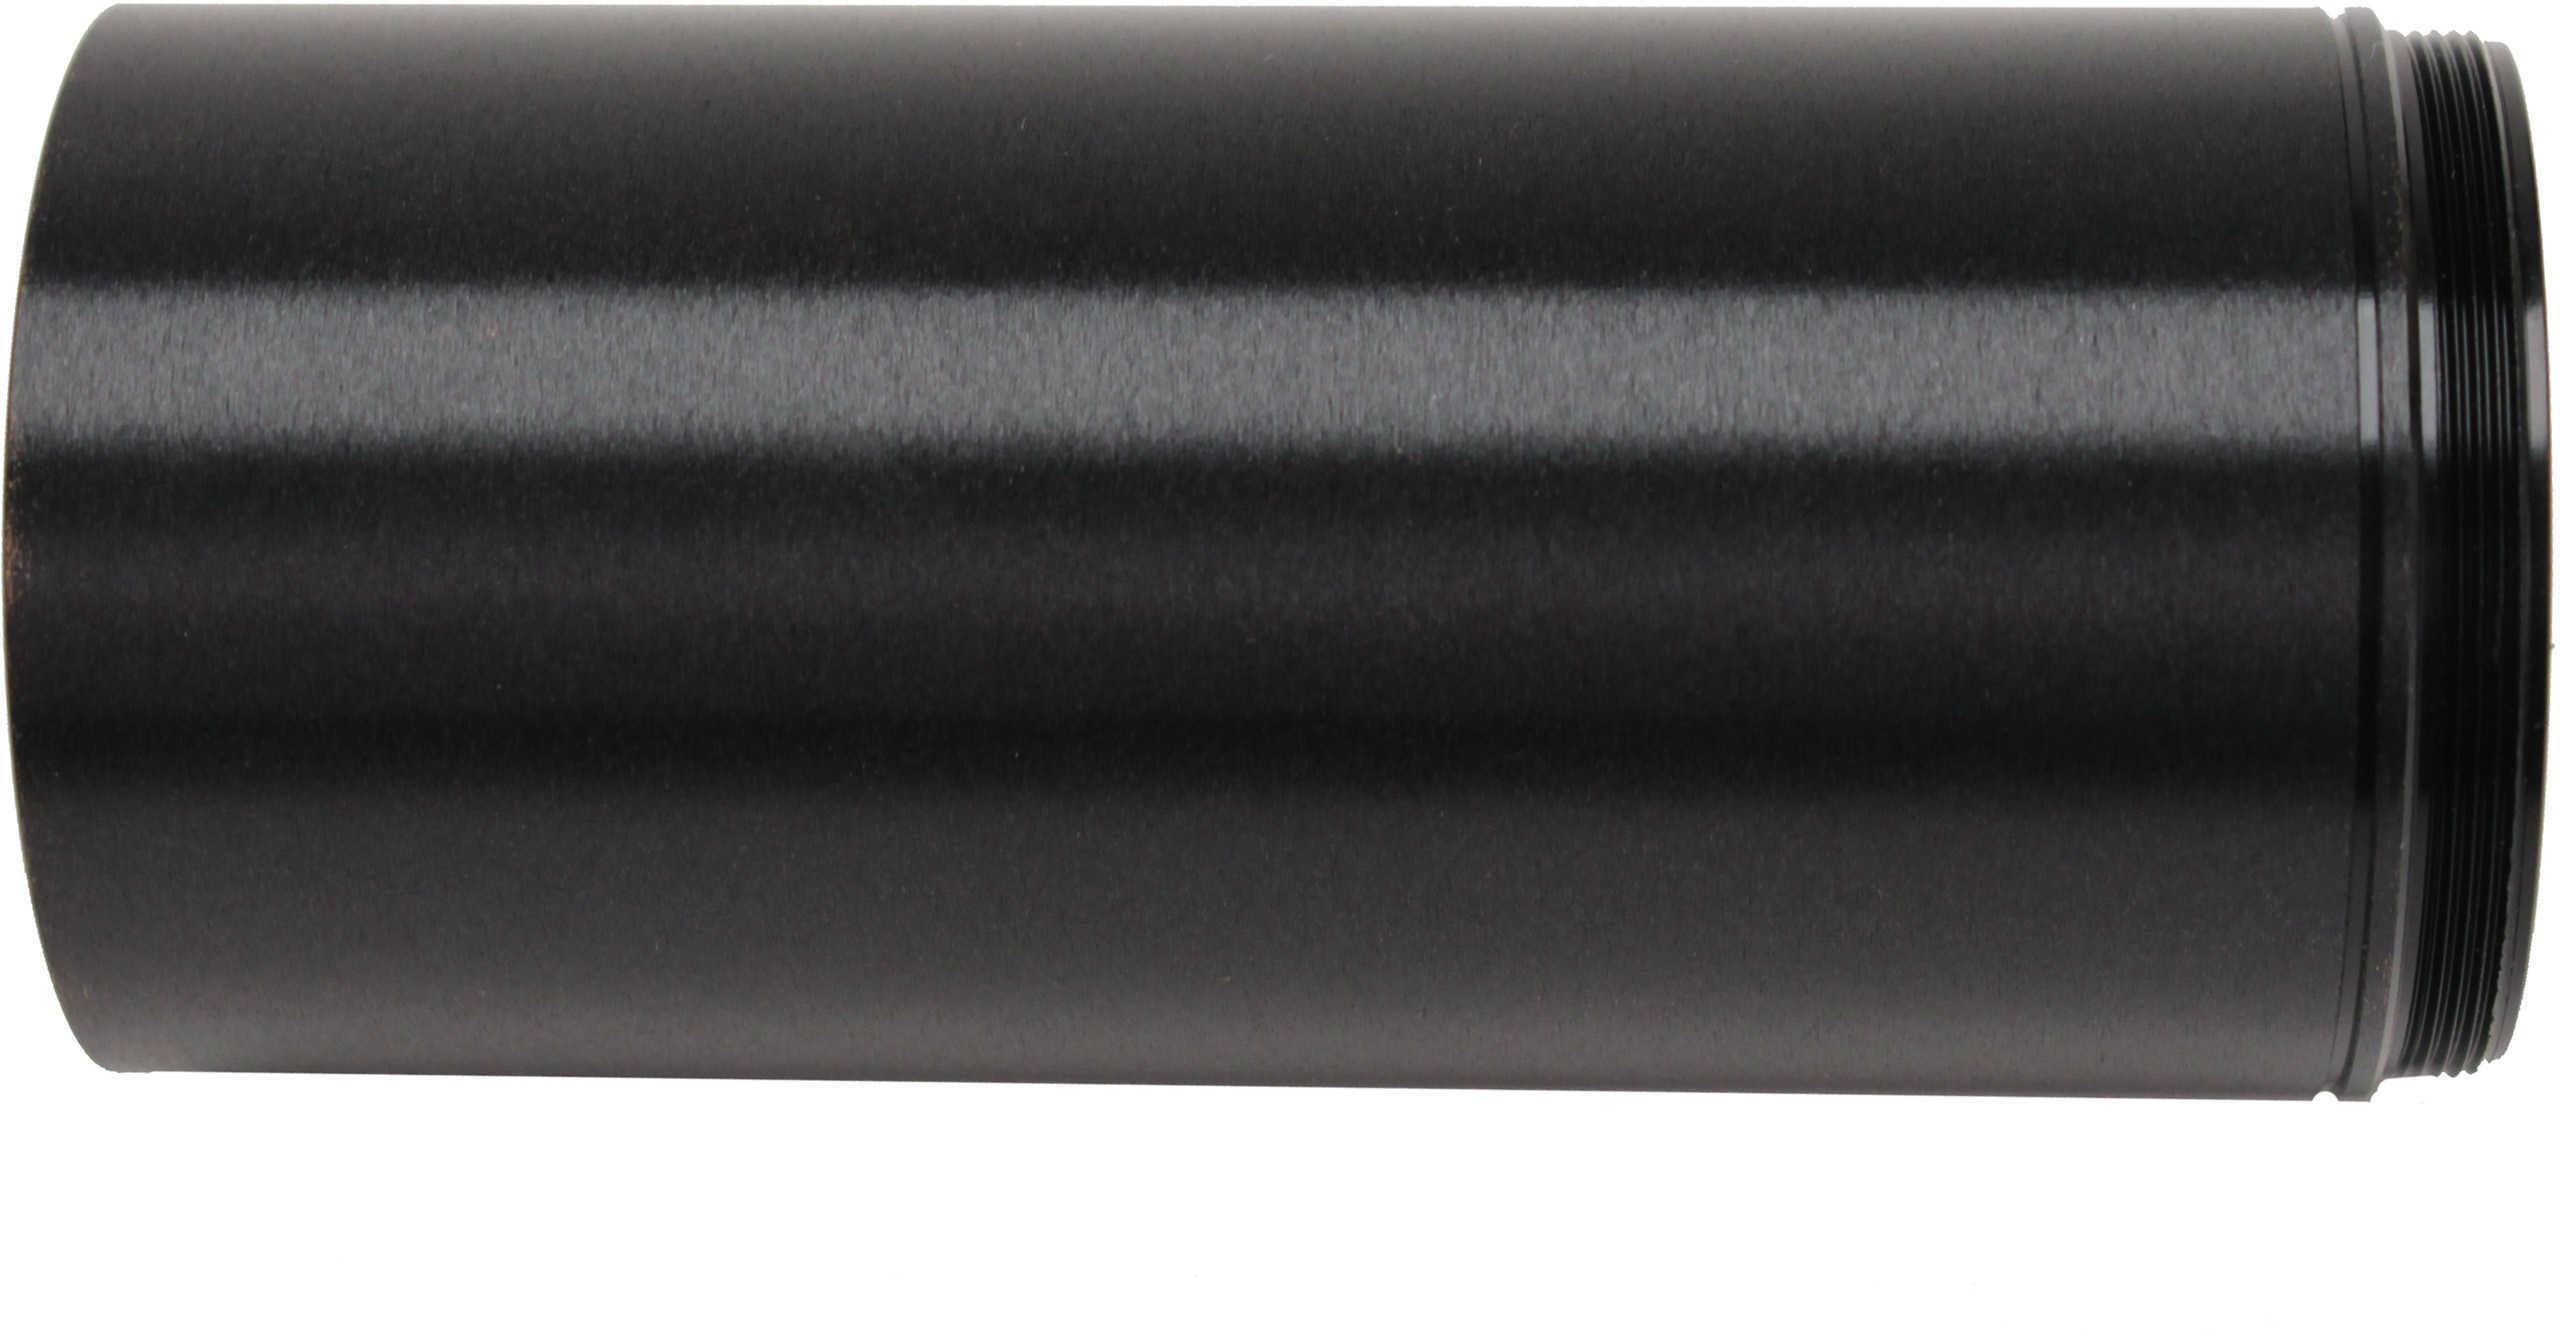 "Leupold Scope Smith Lens Shade Lens Shade 4"" 50mm Matte Black Md: 52353"